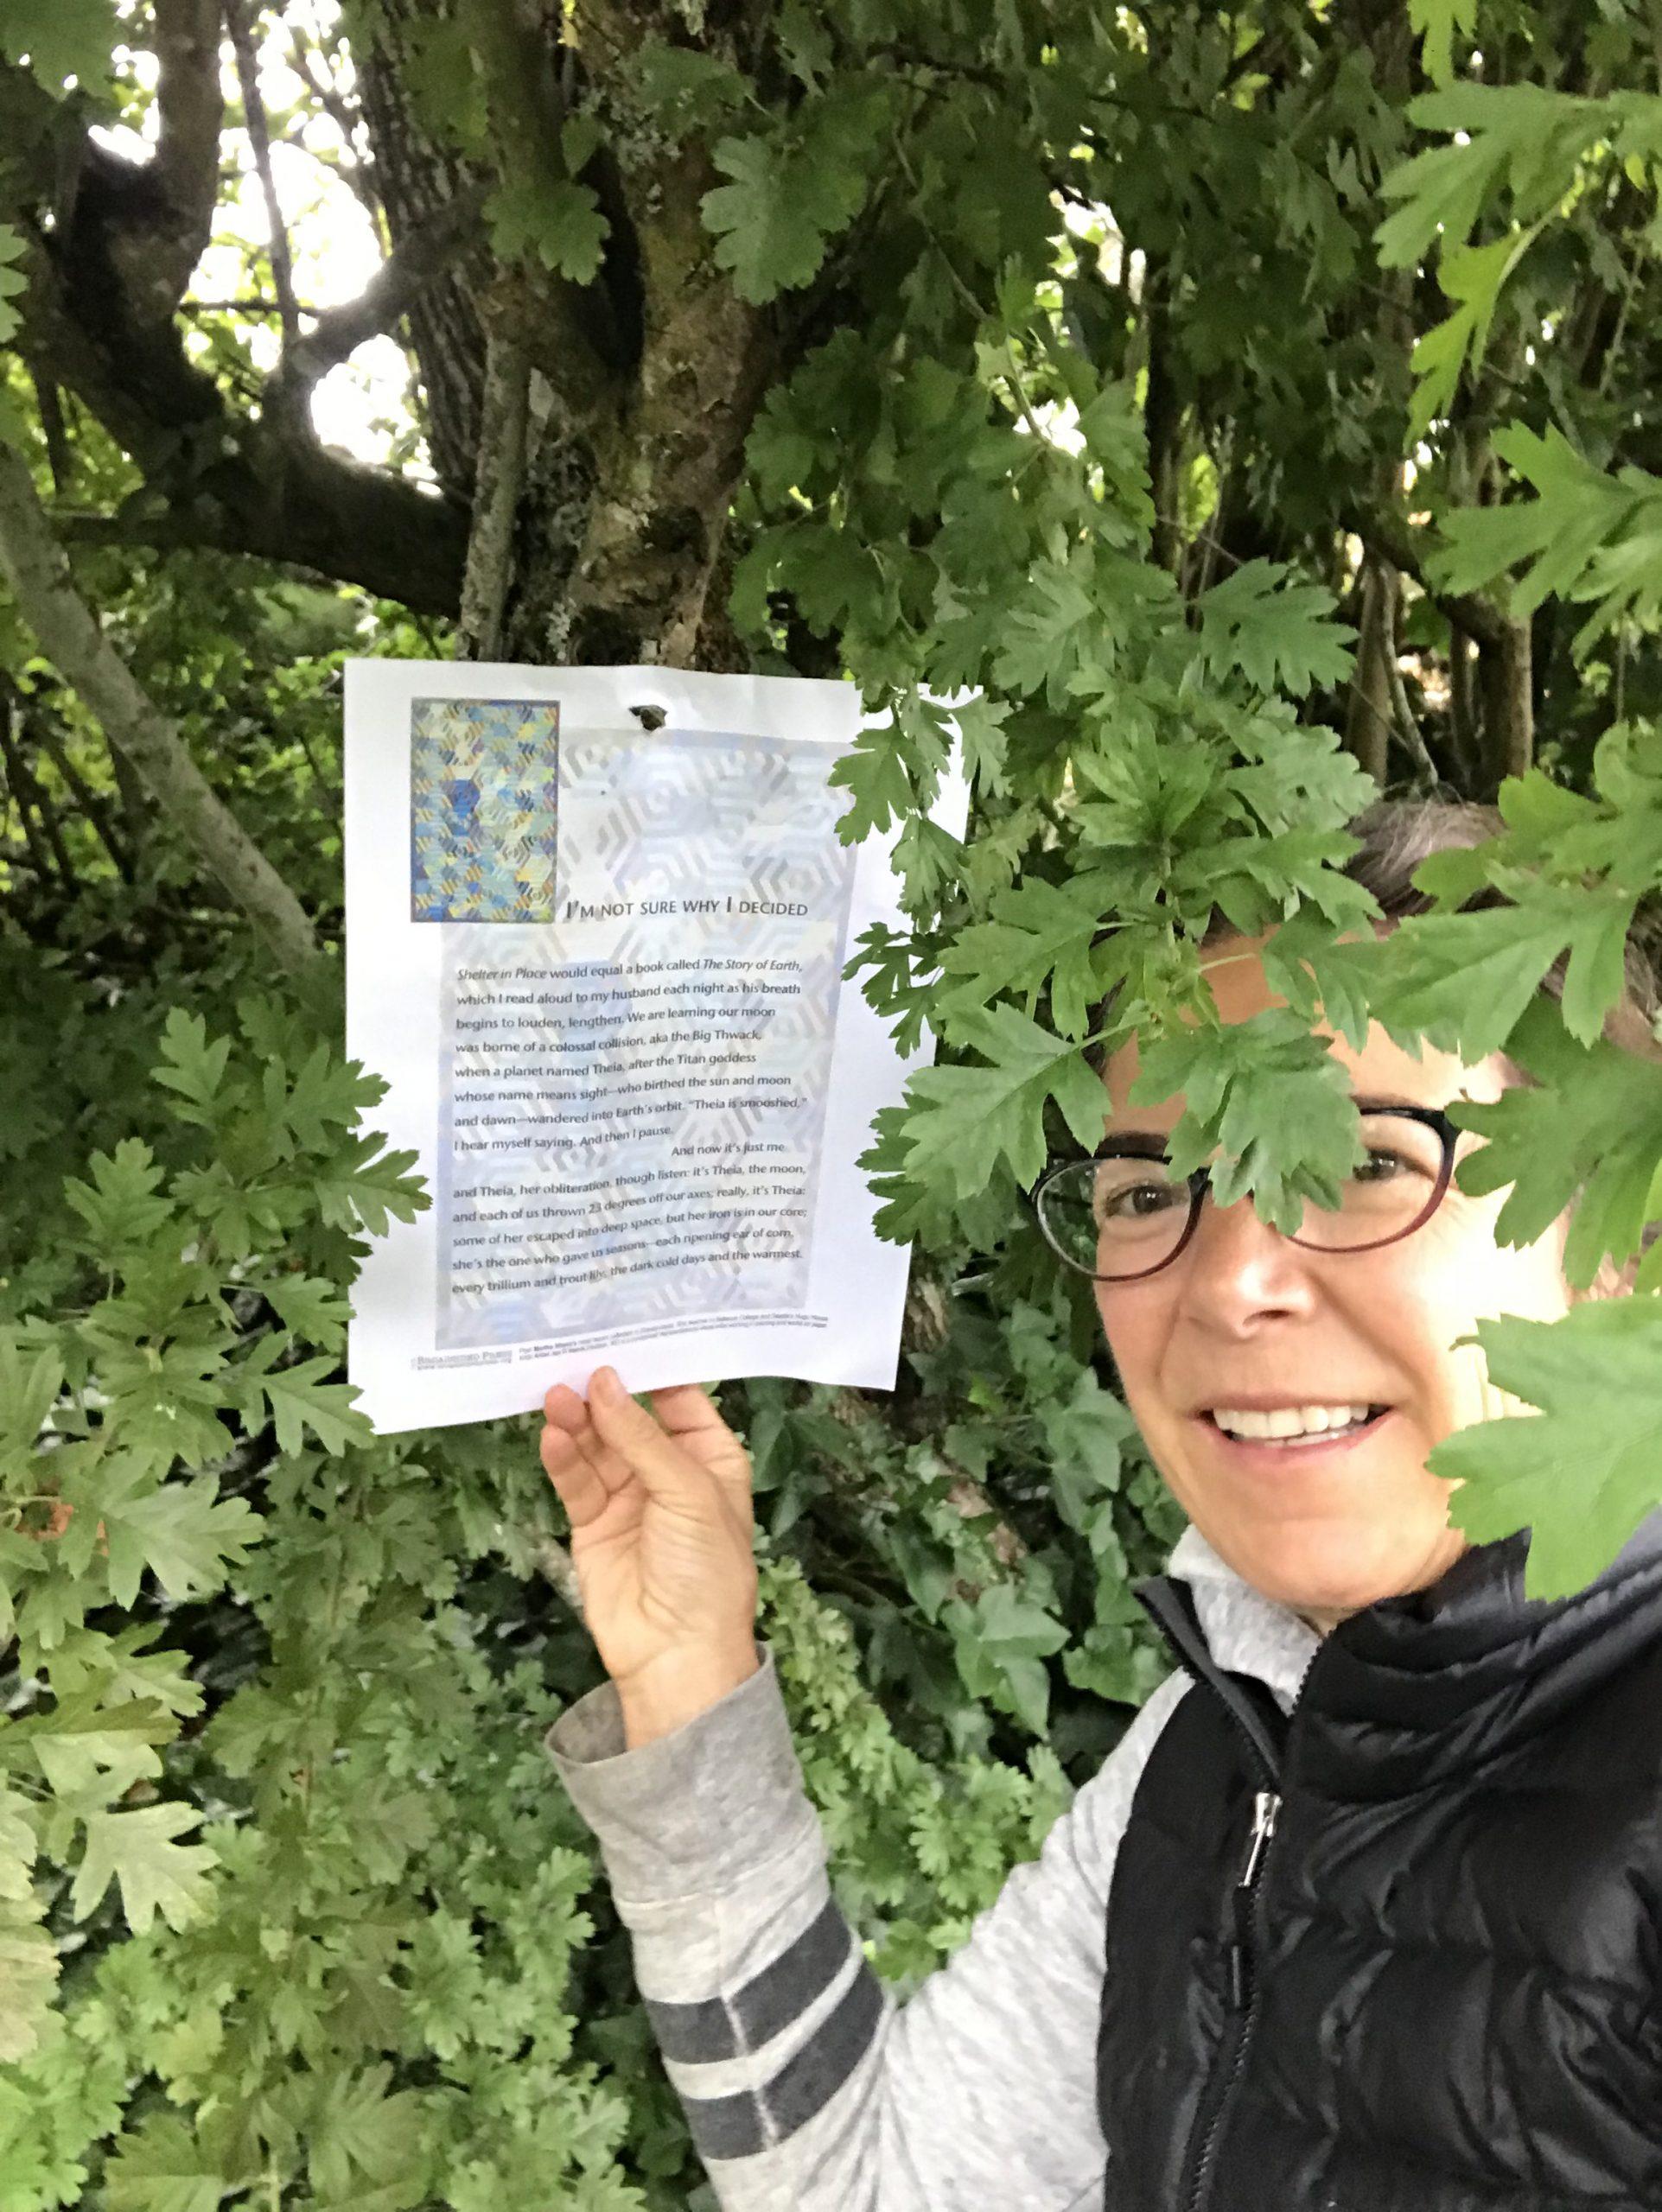 Martha Silano under oak leaves next to her broadside.